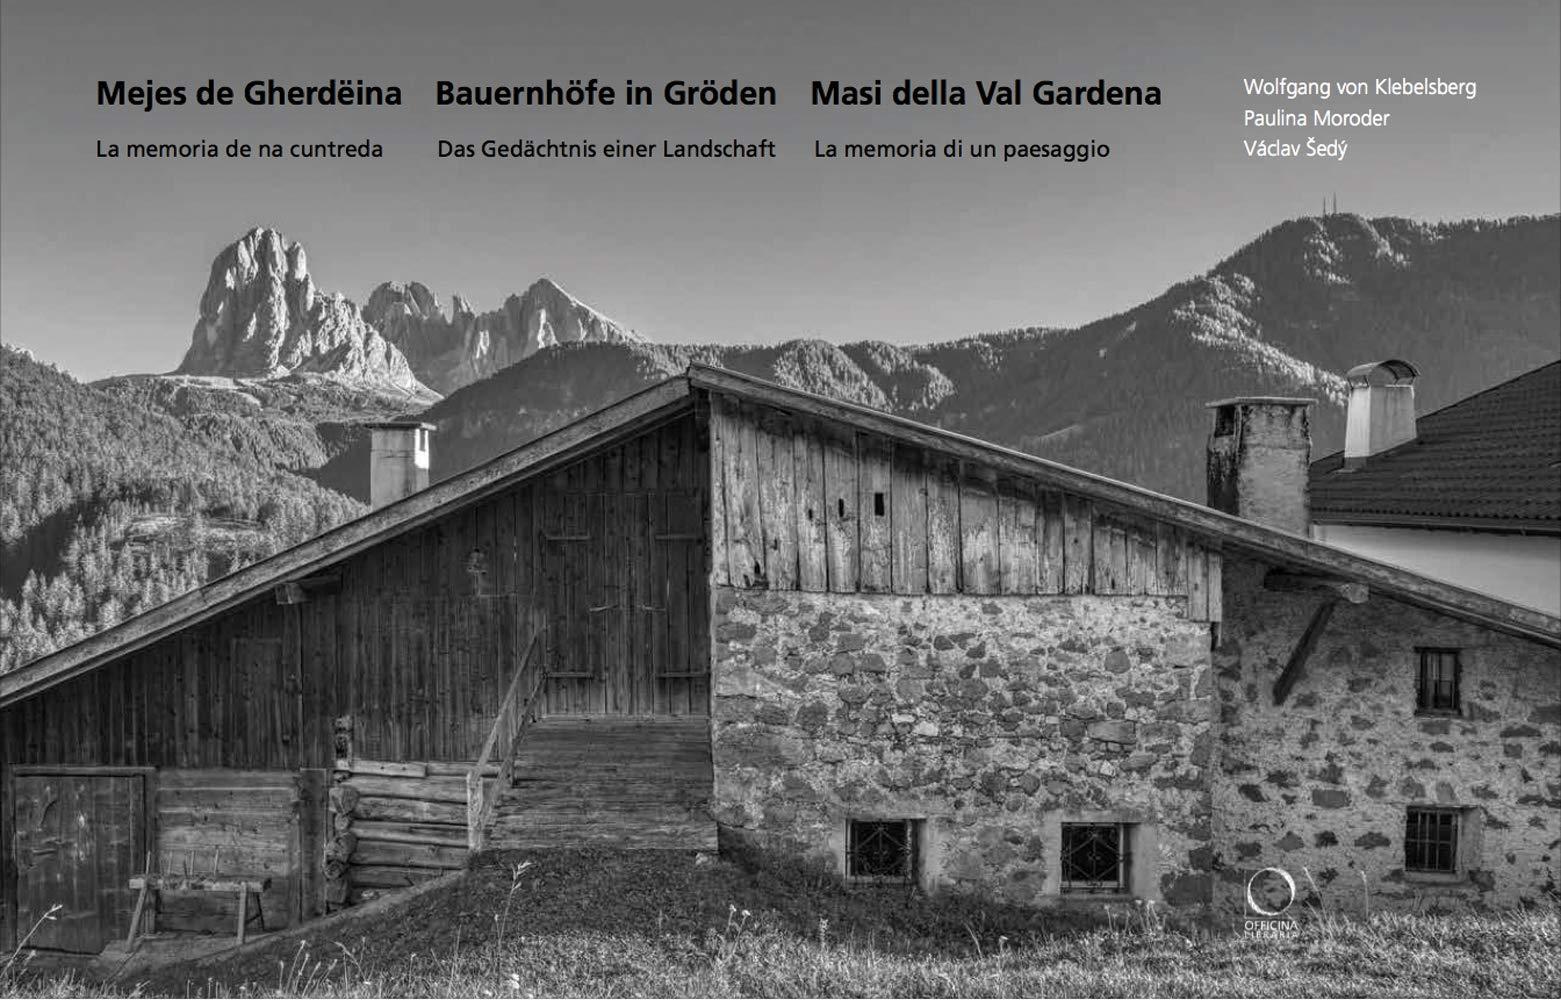 Mejes de Gherdeina - Bauernhoefe in Groeden - Masi della Val Gardena